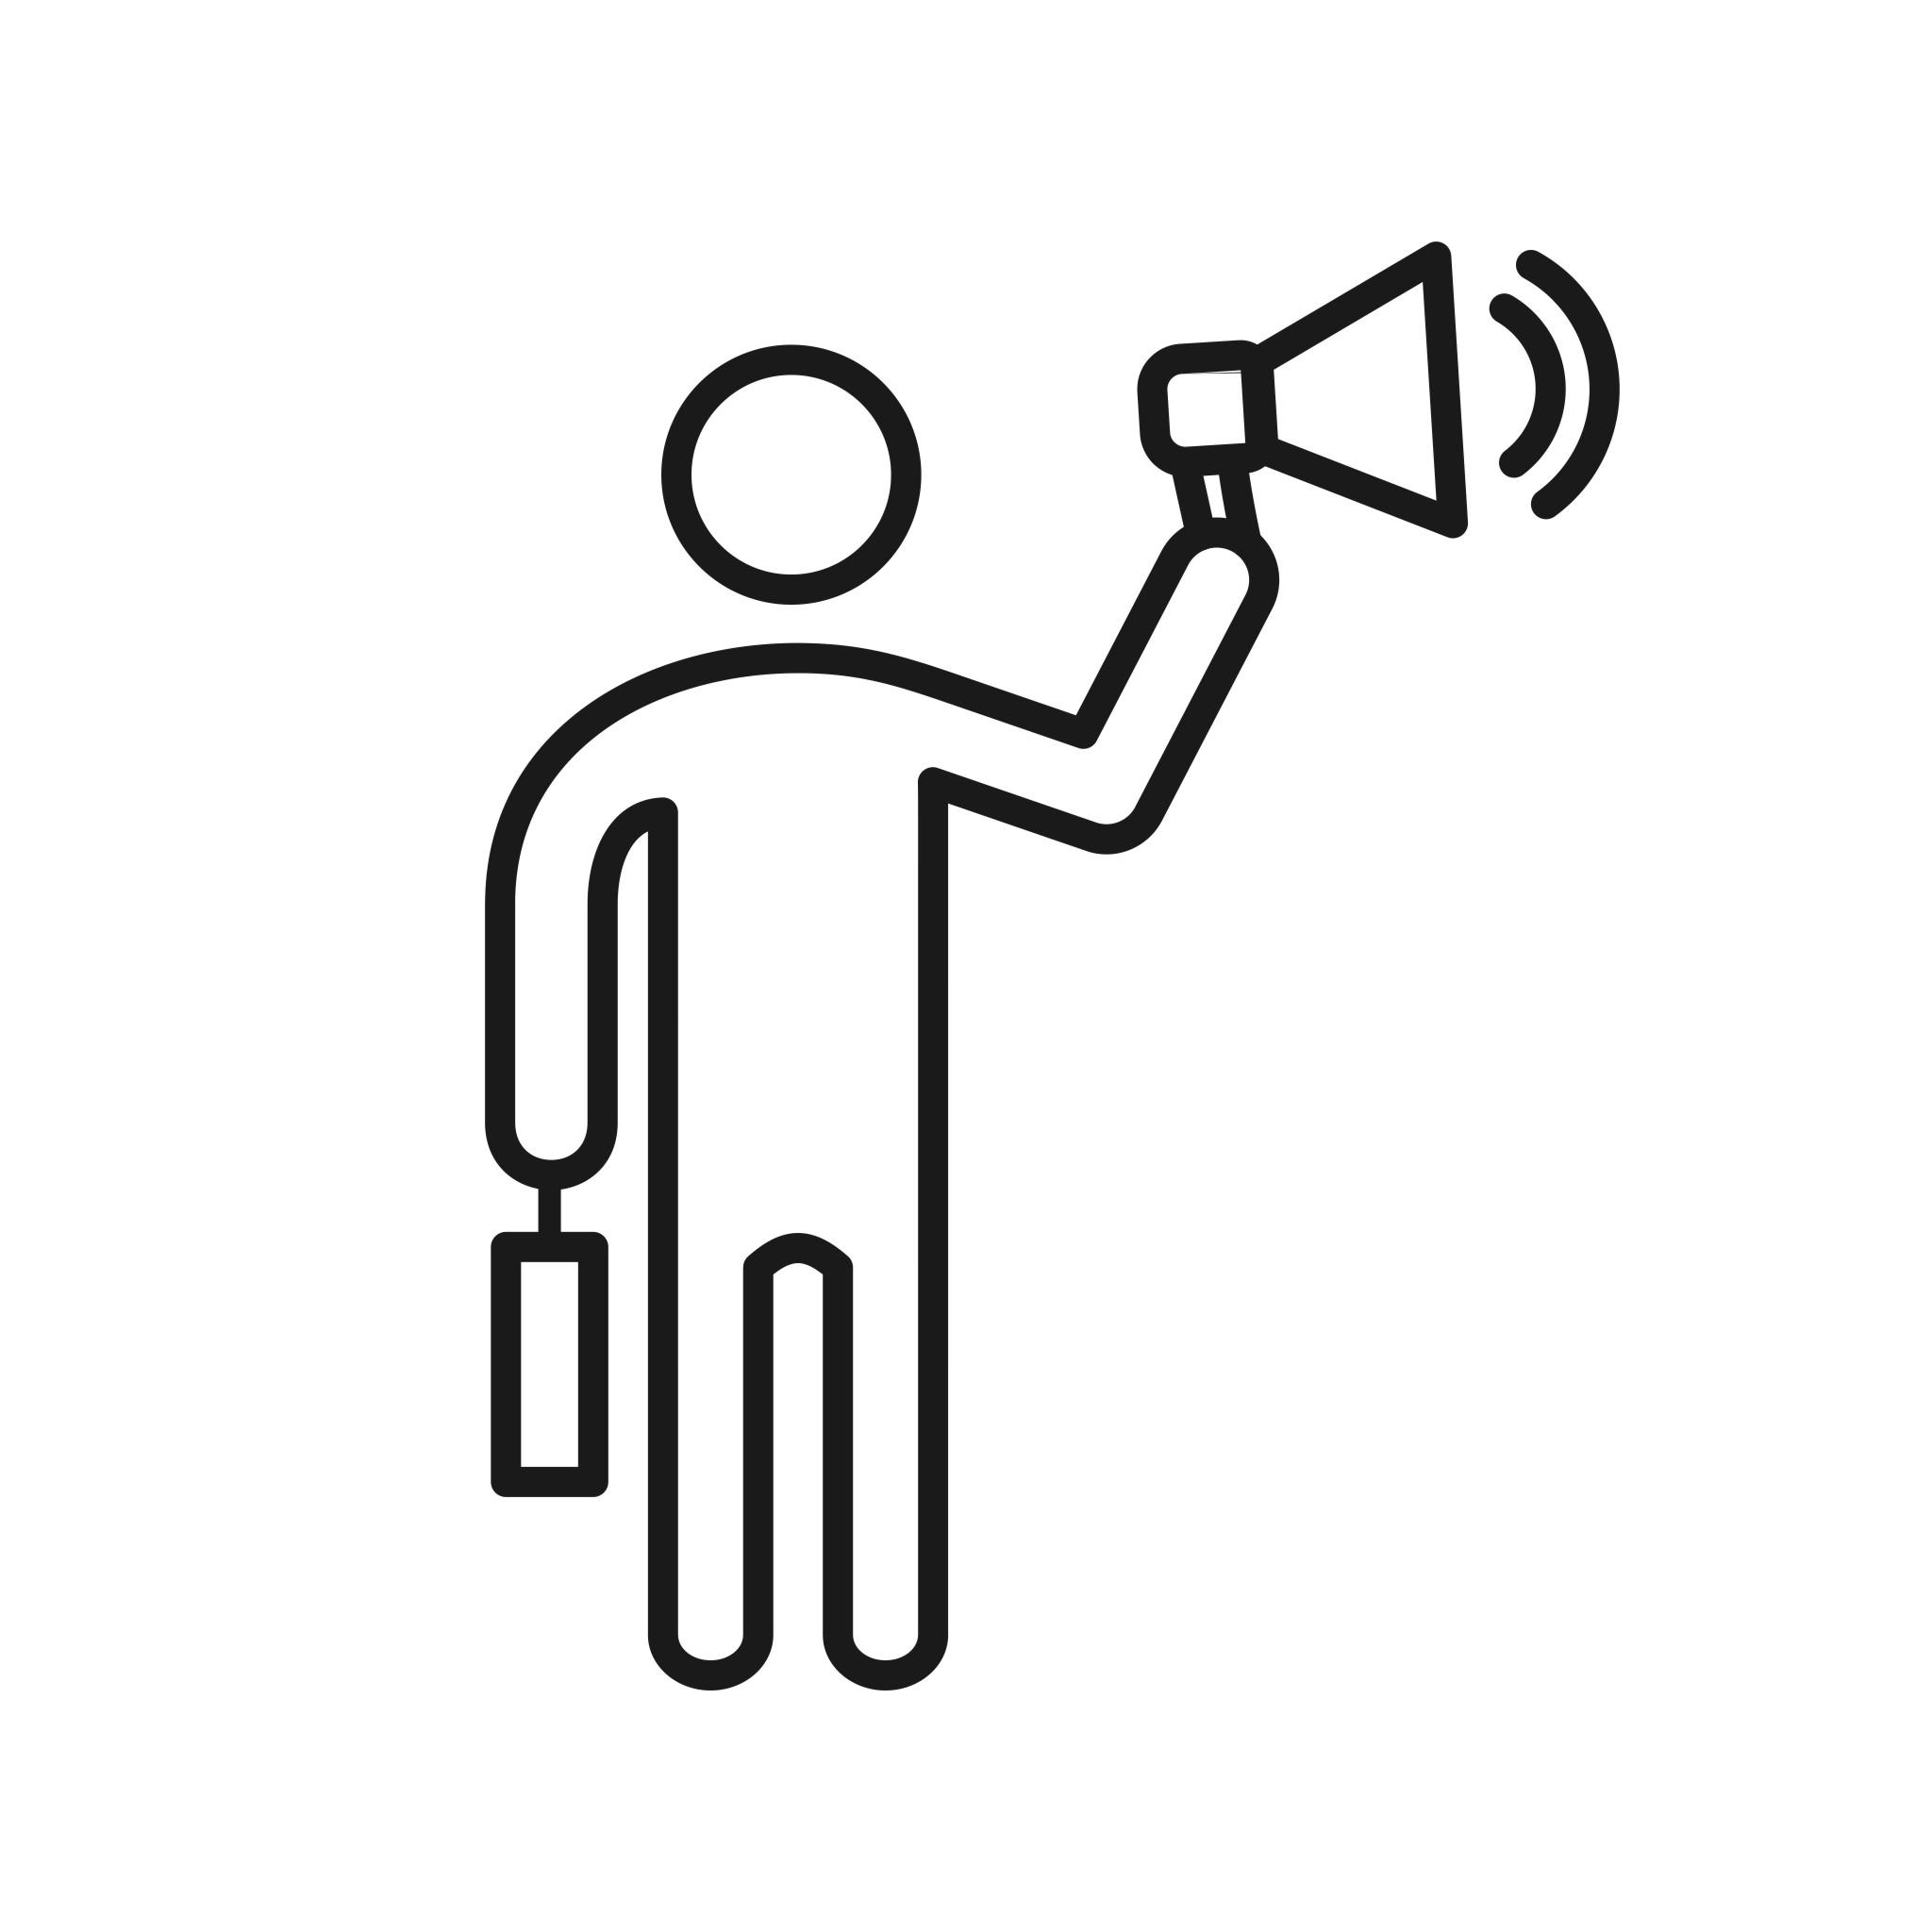 Business Marketing Seo Line Icons